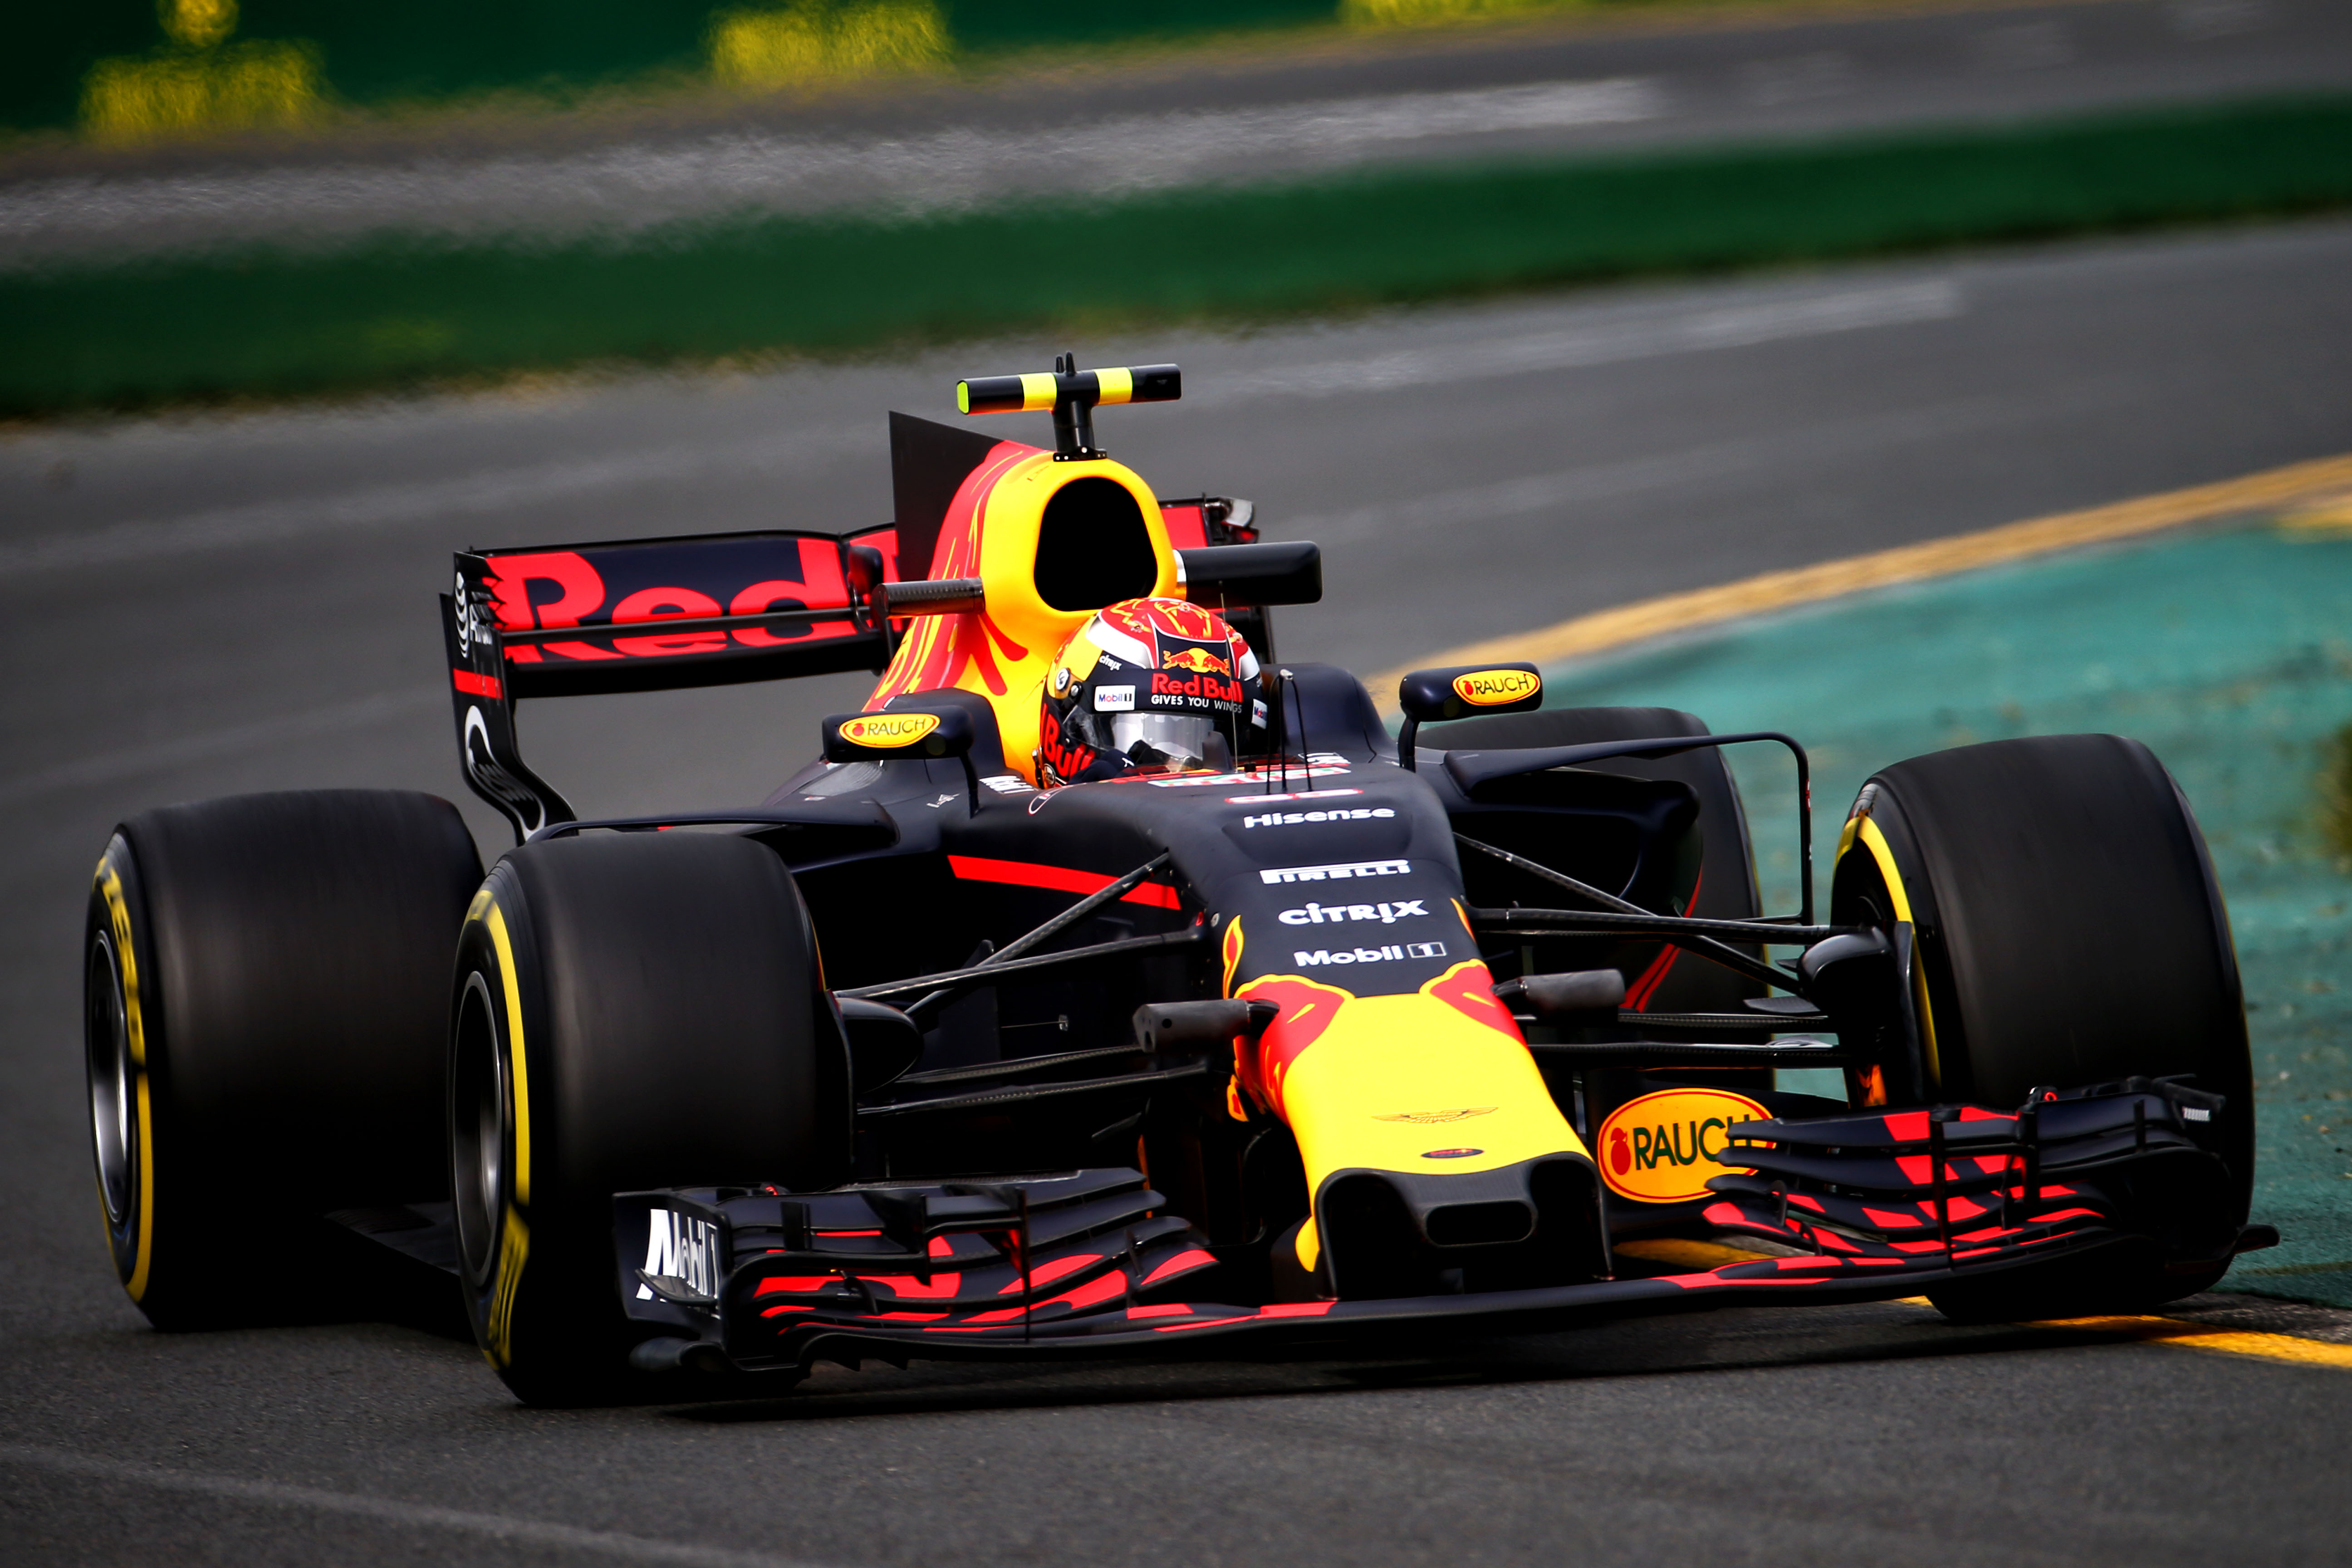 Formula 1 Car Hd Wallpapers Wallpapers Australian Grand Prix Of 2017 Marco S Formula